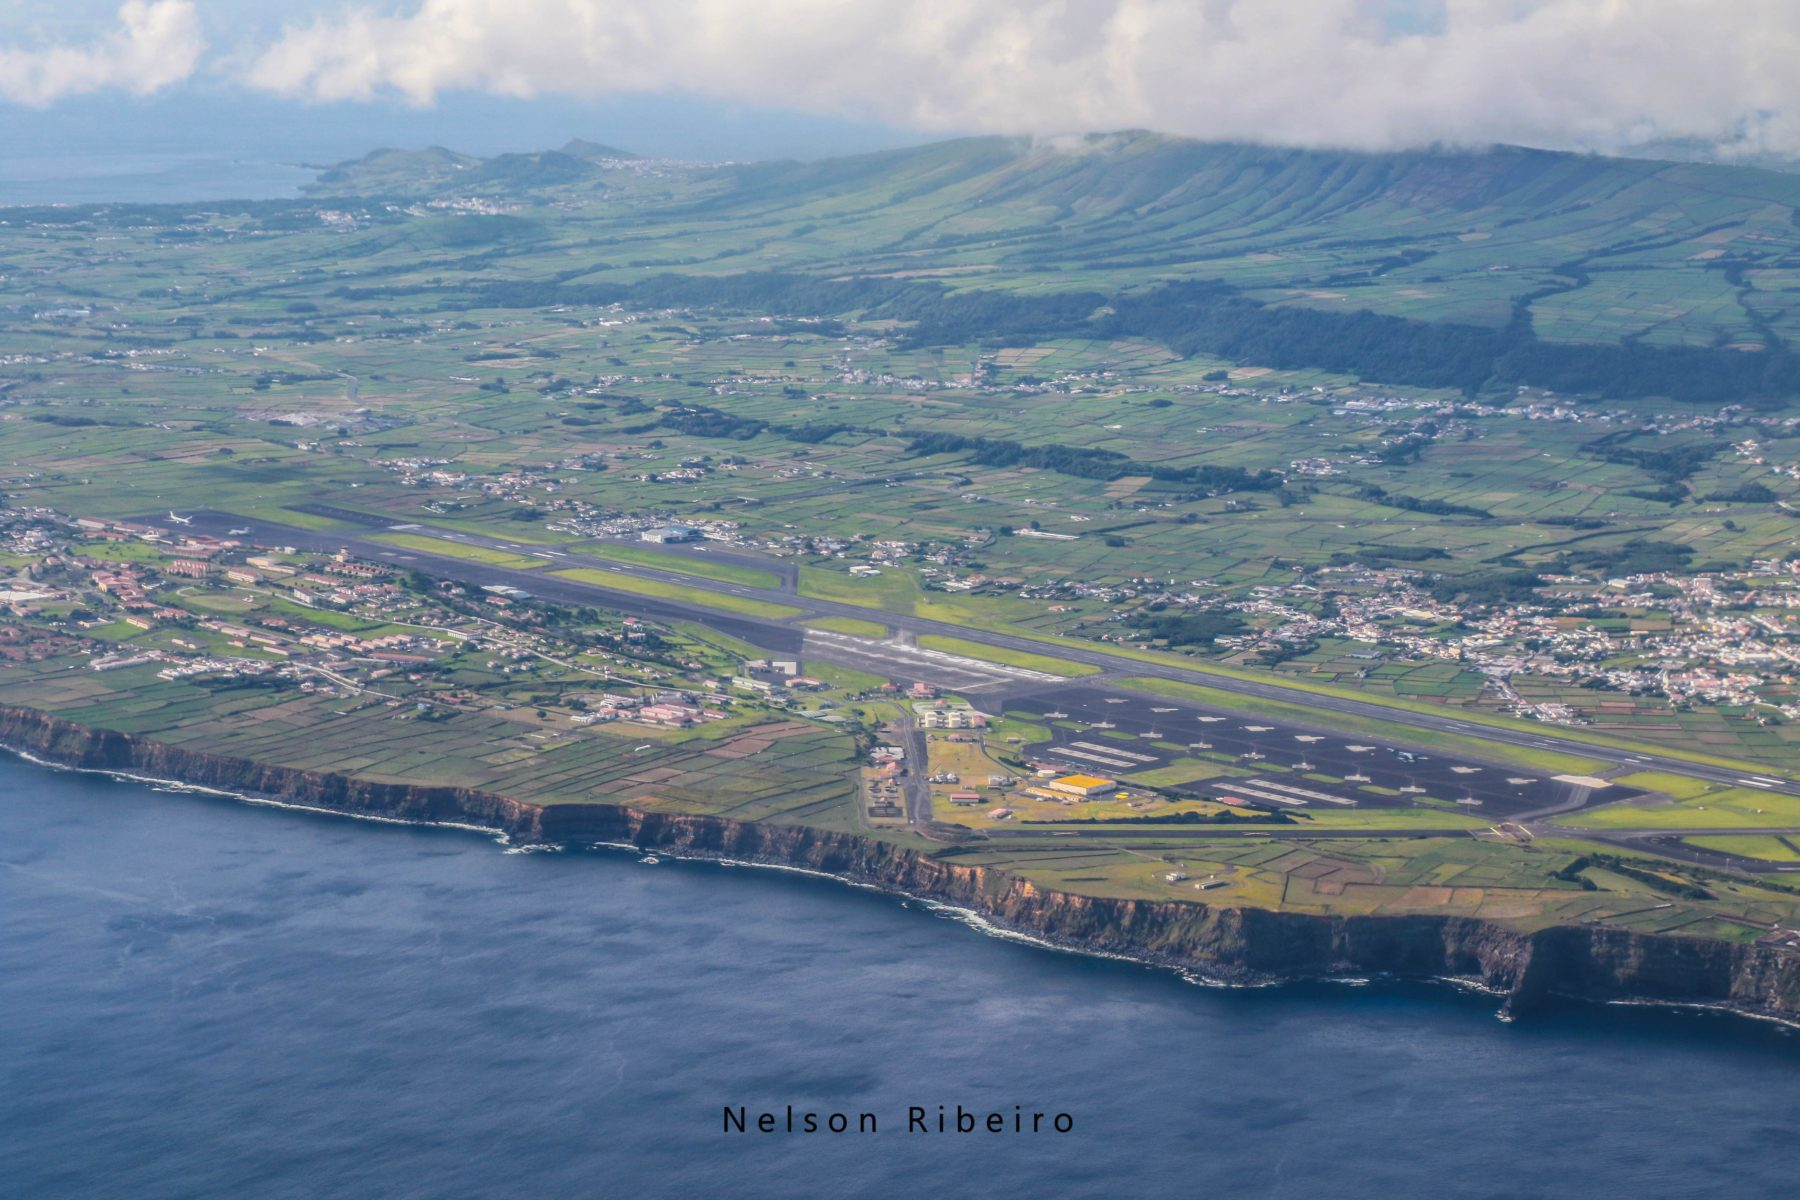 Aeroporto das Lajes